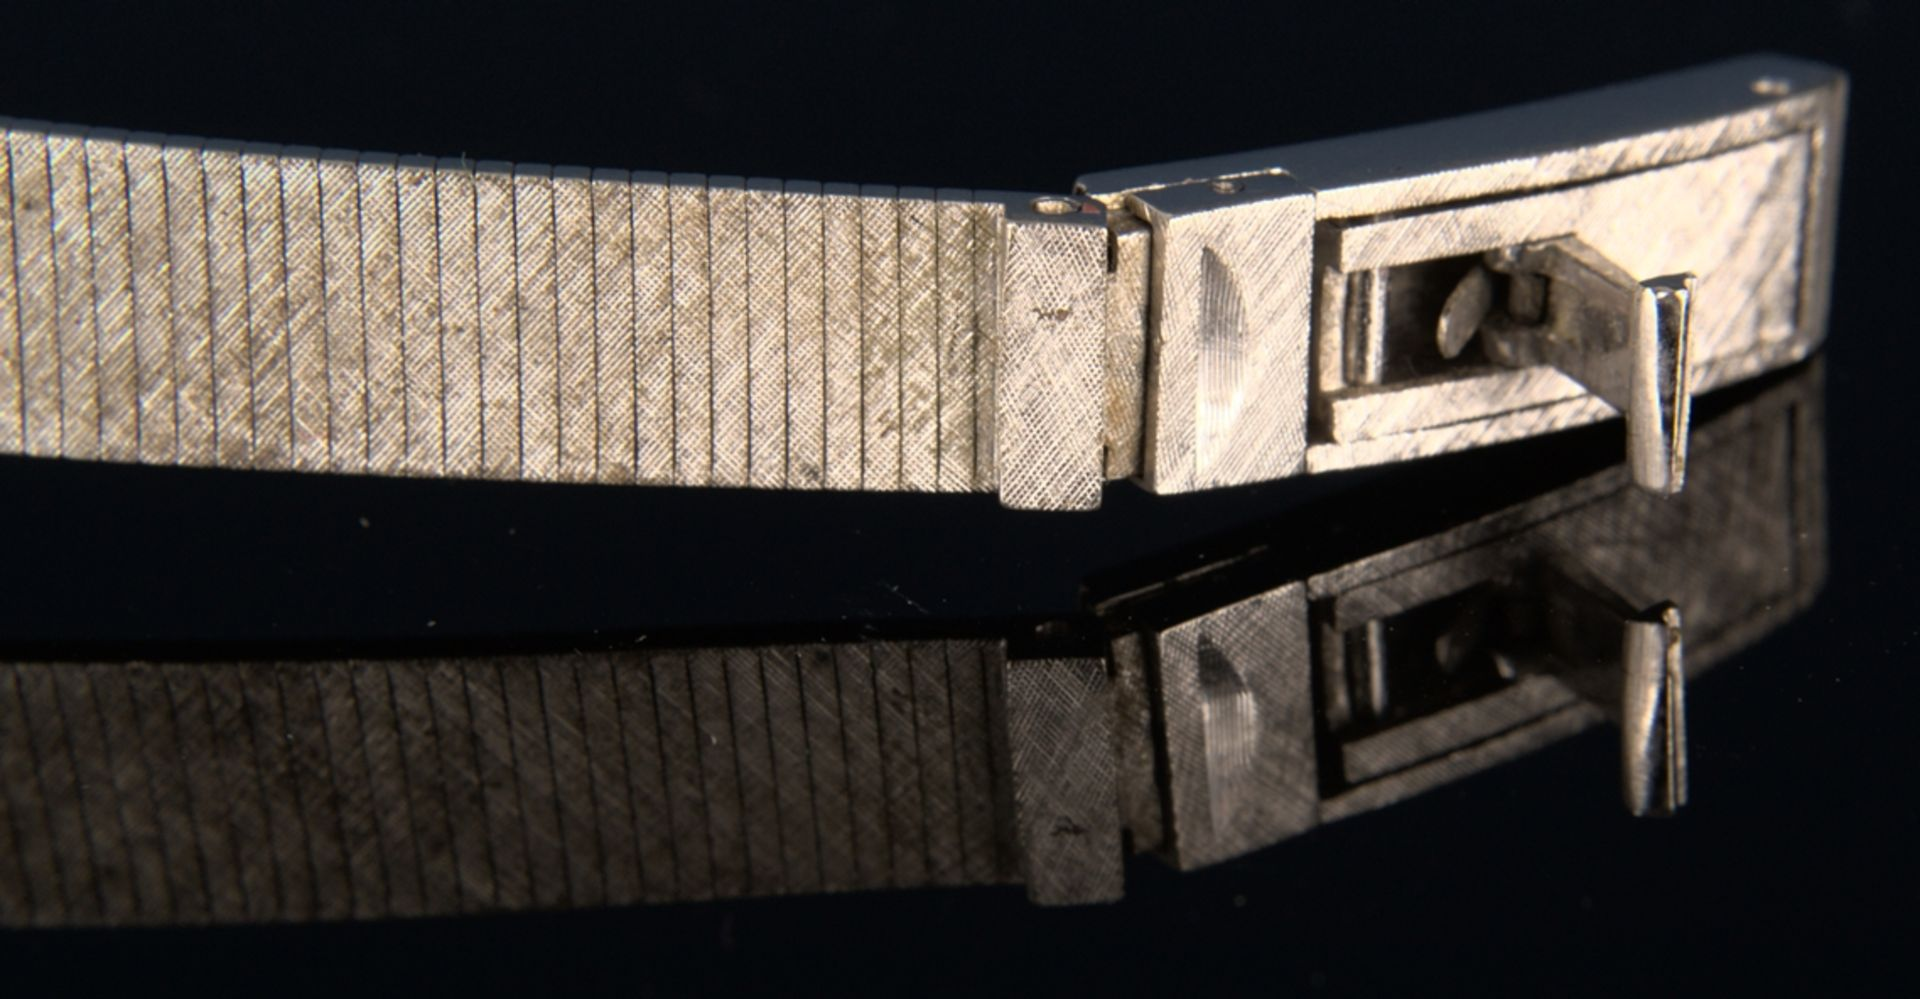 "Elegante COCKTAIL - Damenarmbanduhr der Marke ""ANKER - ROXY"" - 17 Rubis - Incabloc. Handaufzug, - Bild 5 aus 11"